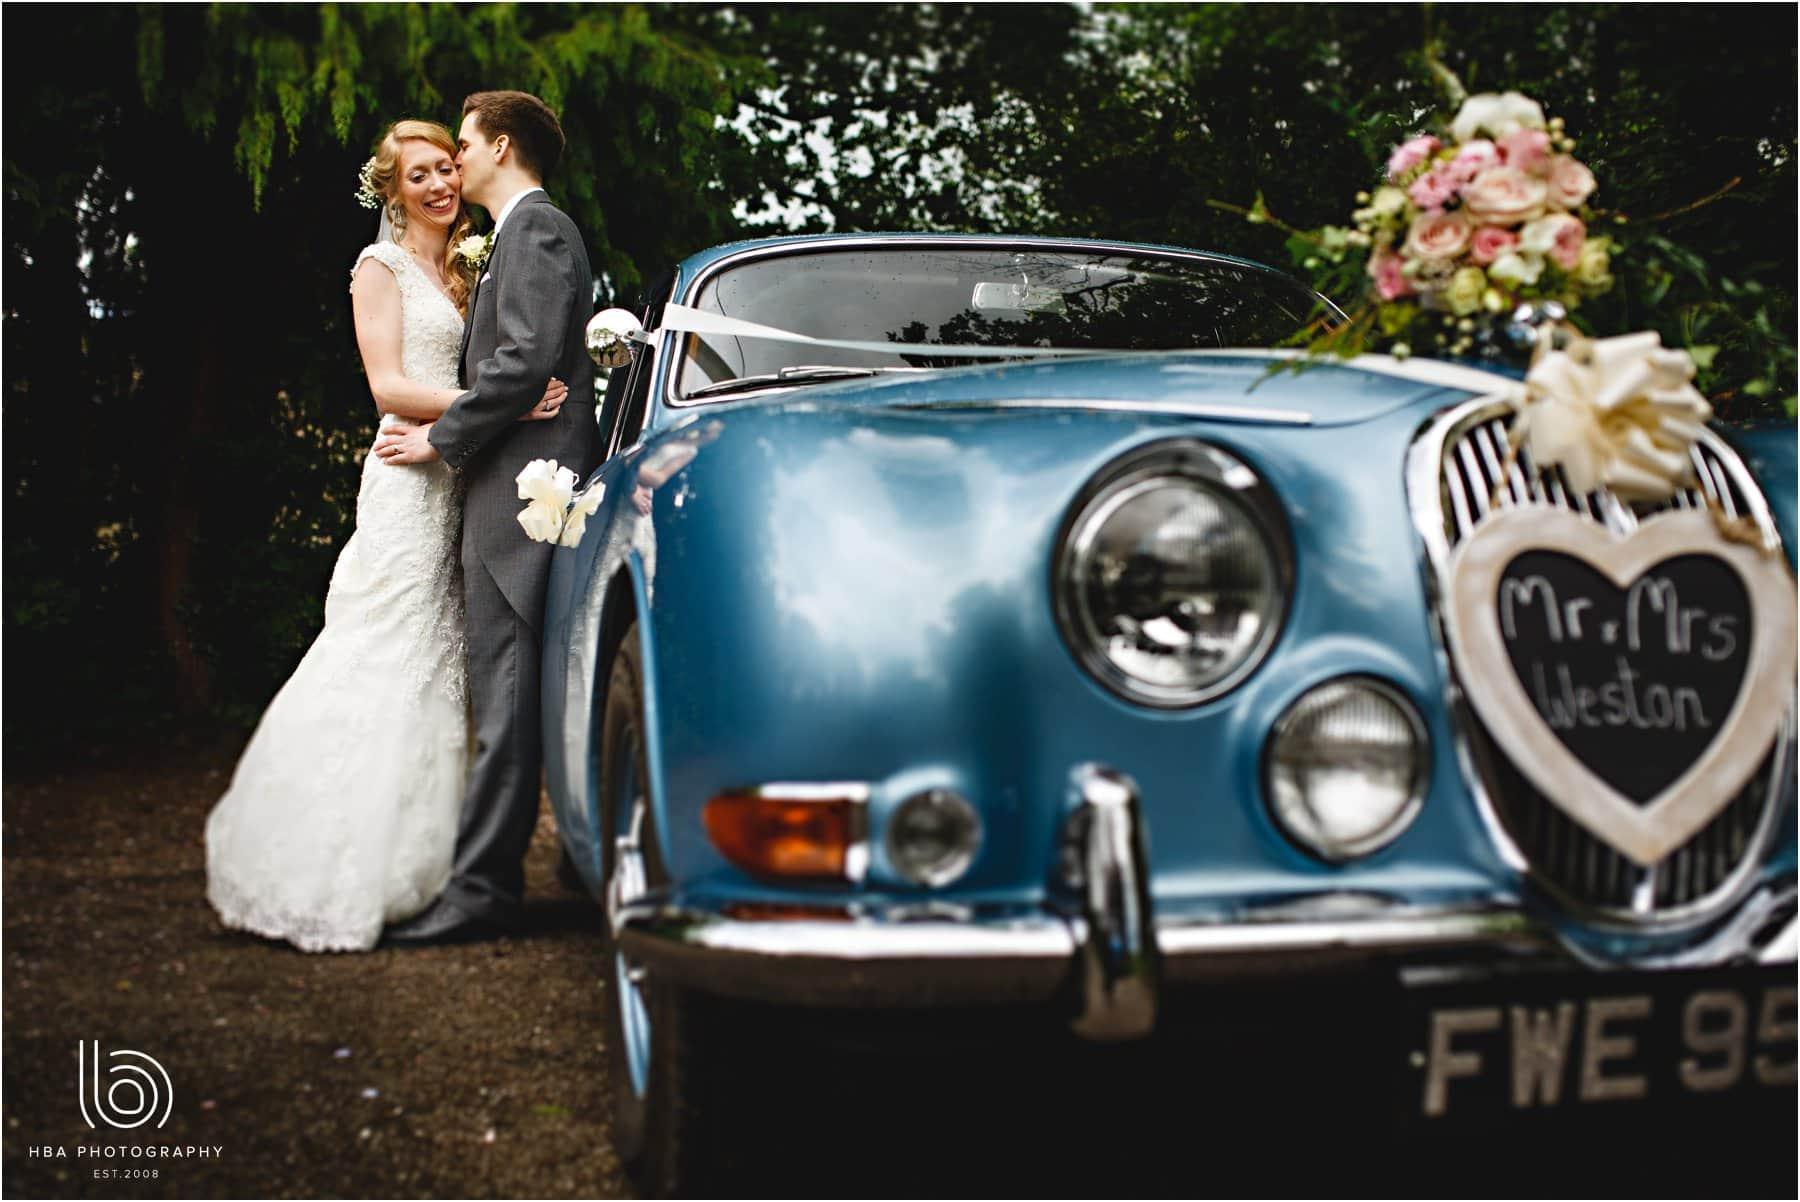 the bride & groom with their car